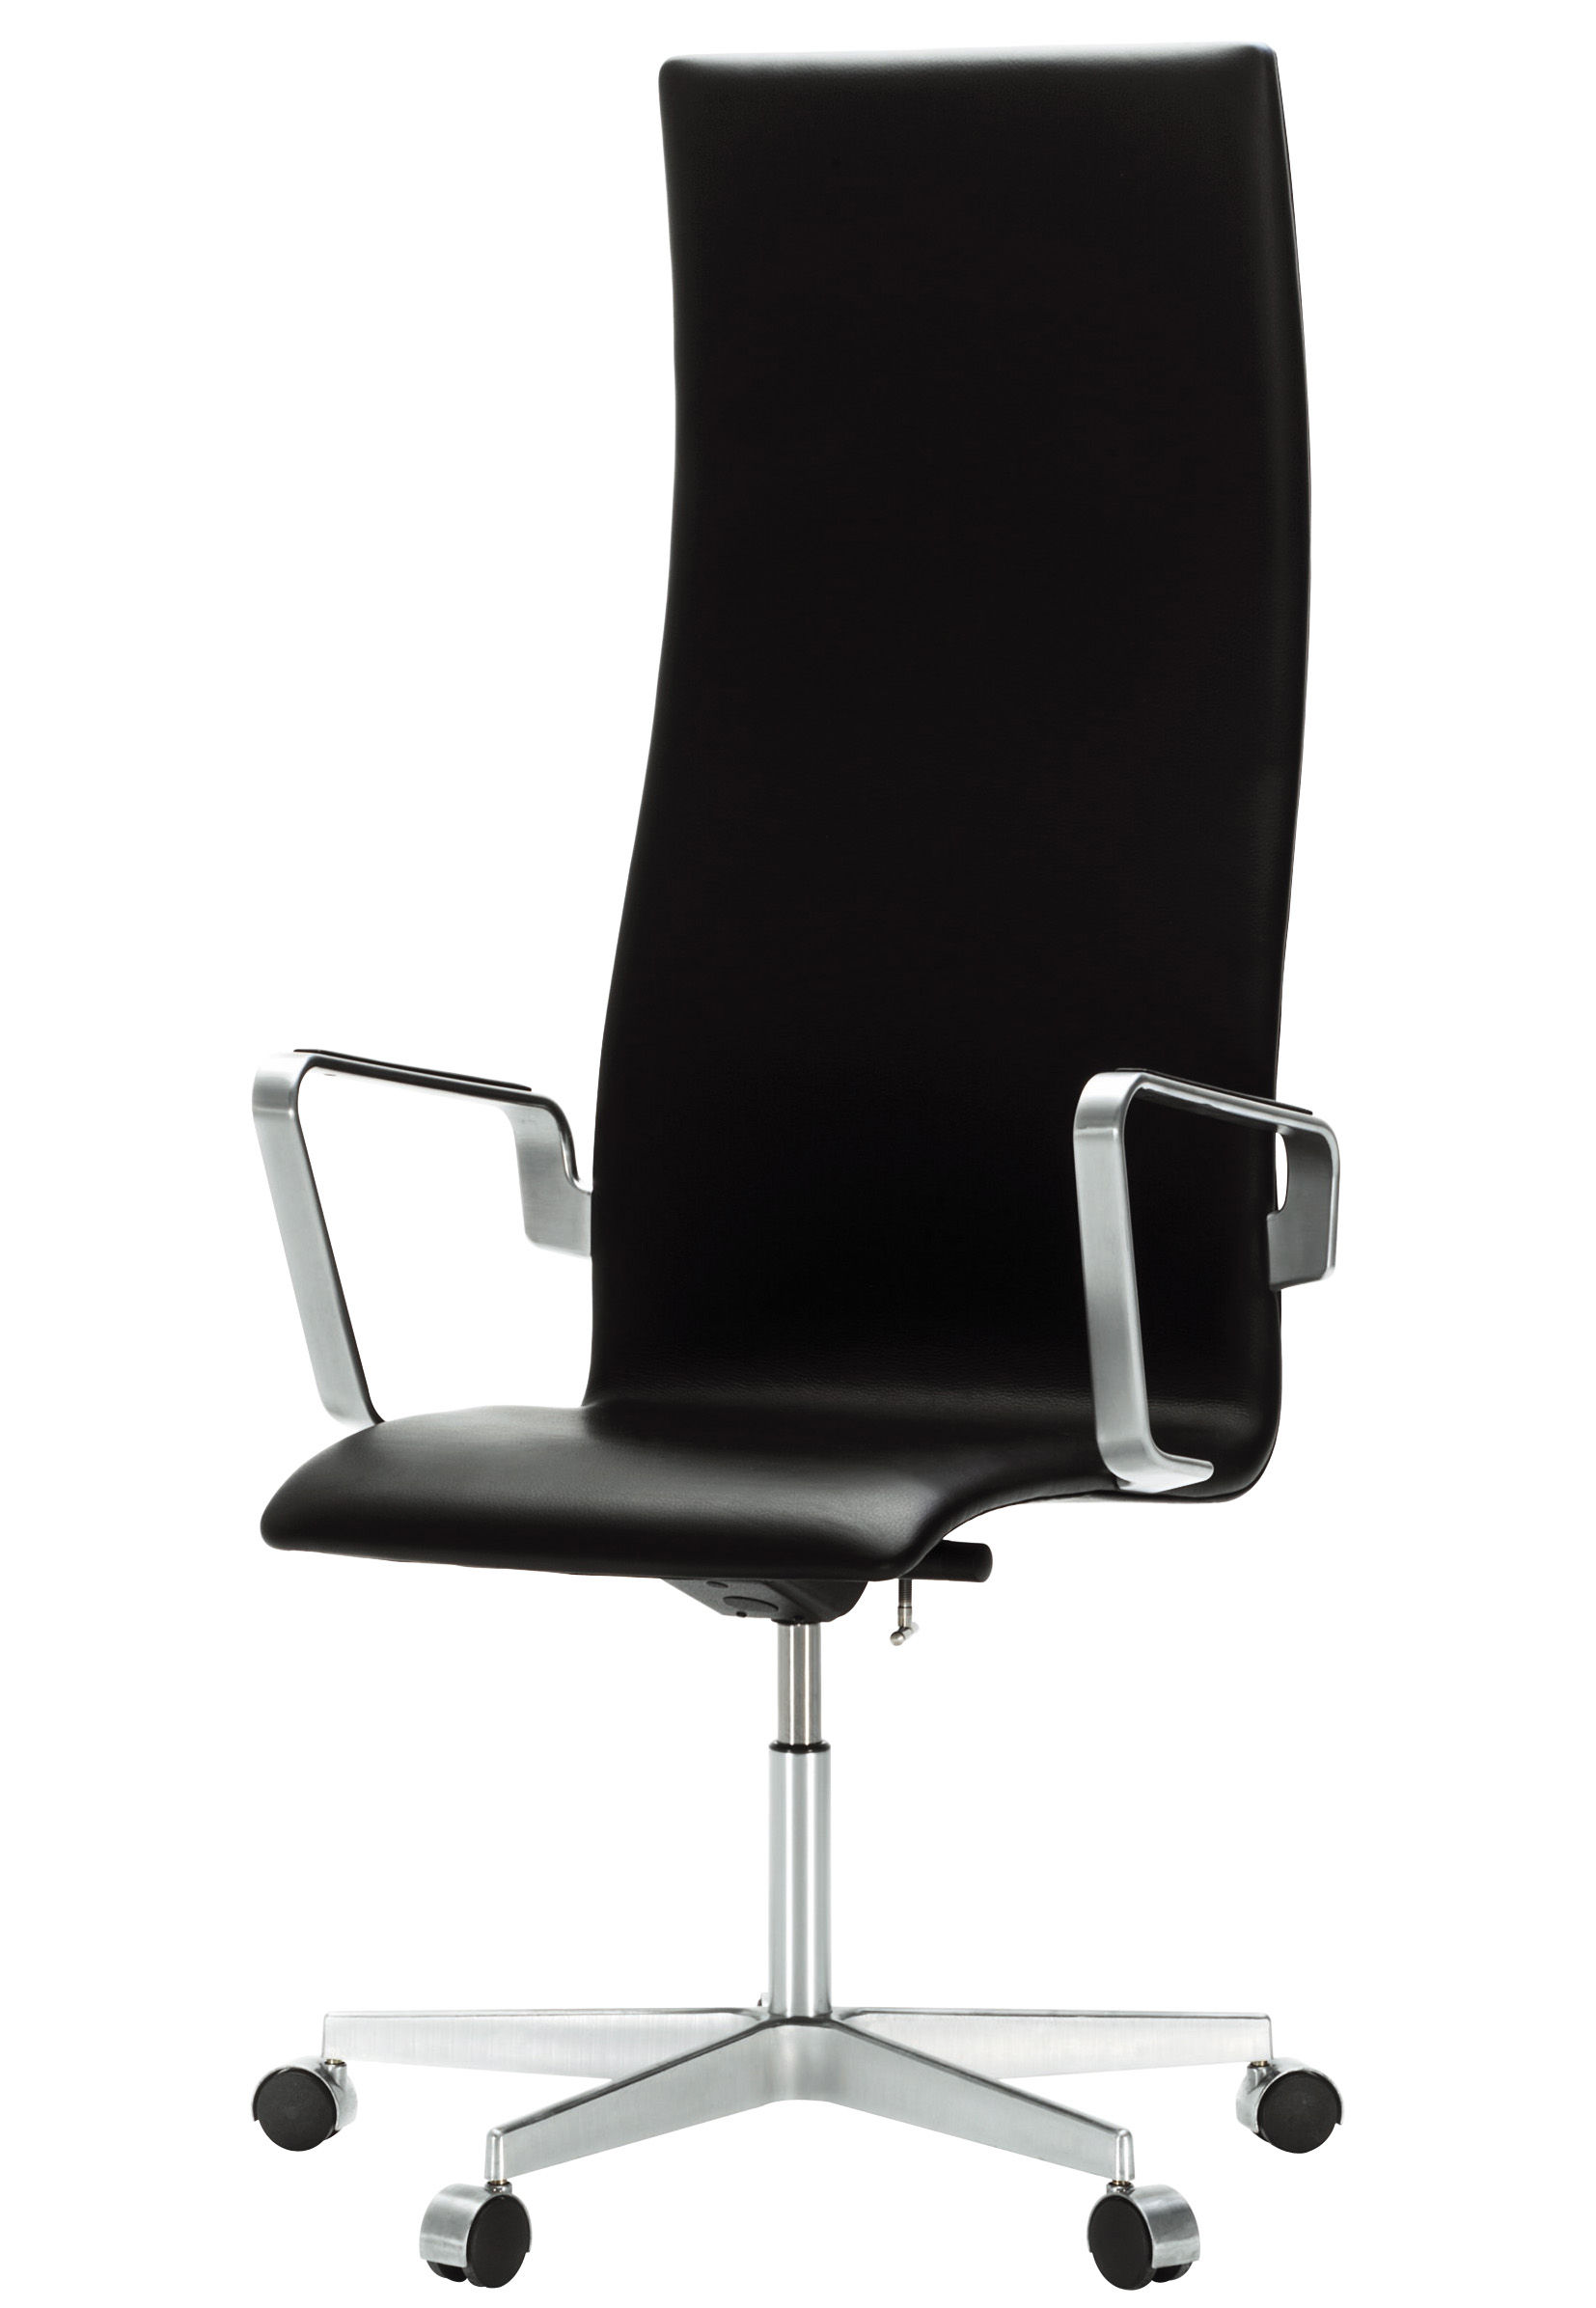 oxford gepolstert h henverstellbar fritz hansen sessel mit rollen. Black Bedroom Furniture Sets. Home Design Ideas